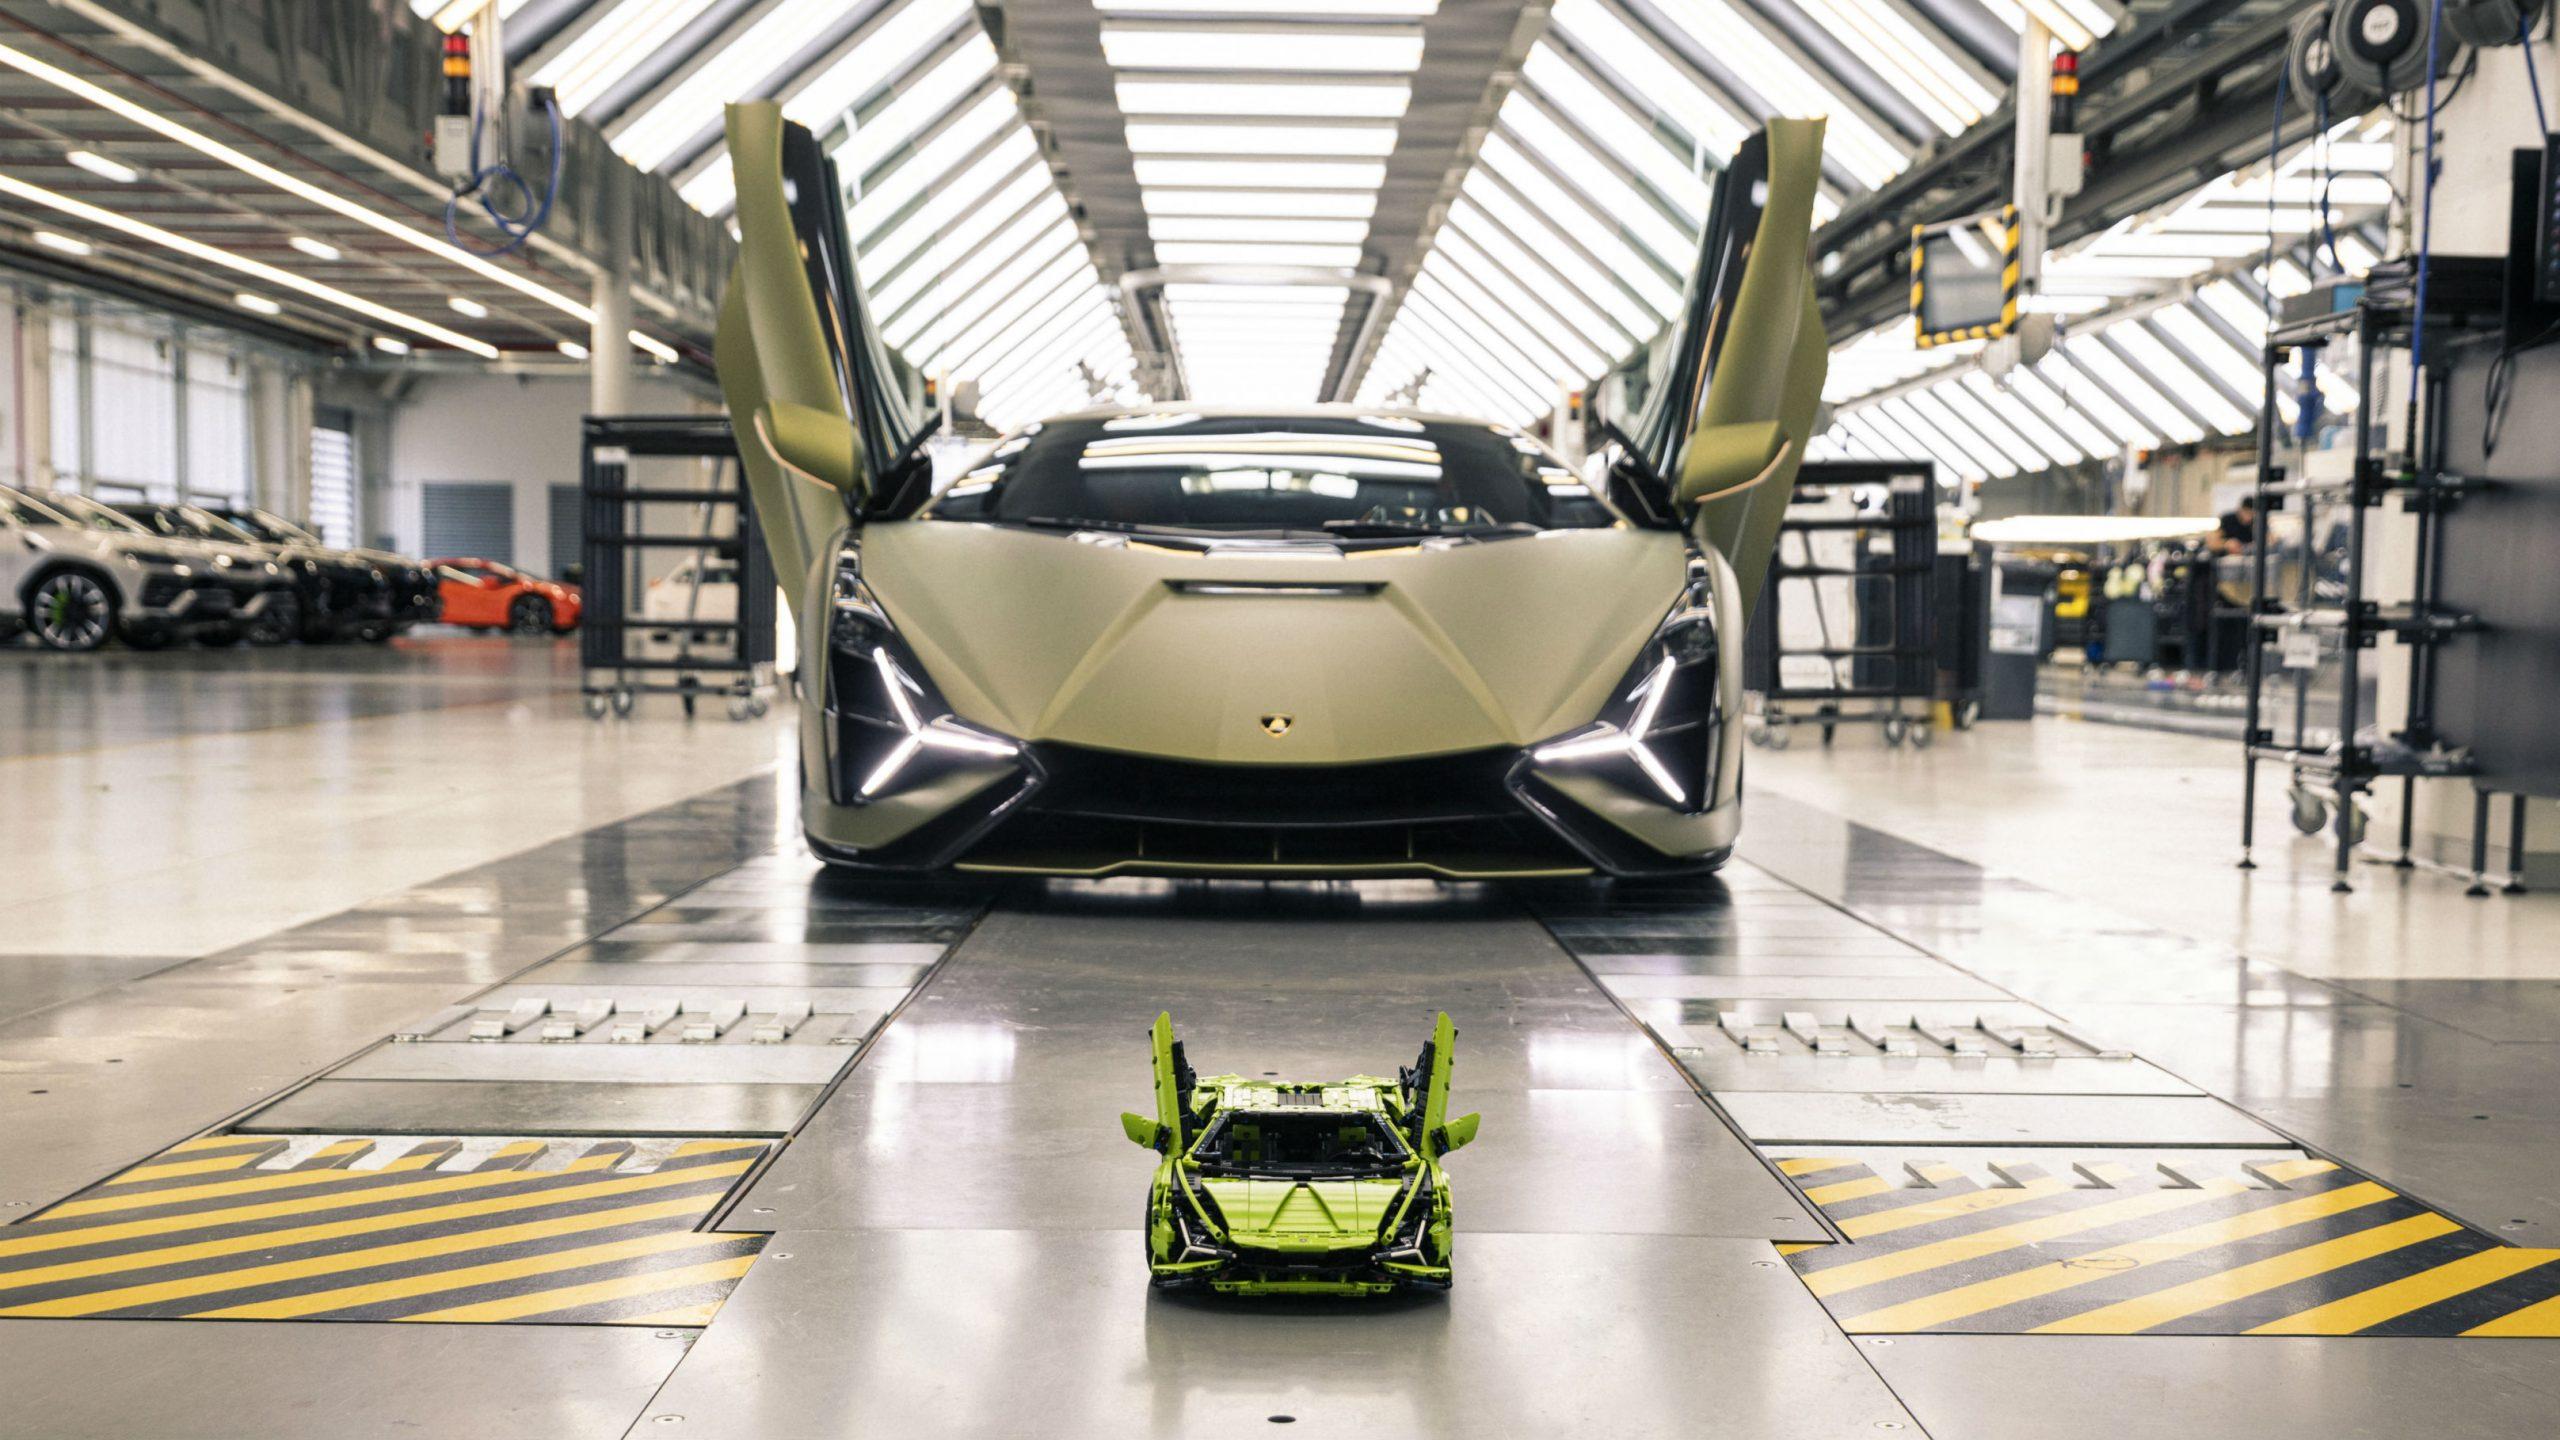 LEGO Technic Lamborghini Sian